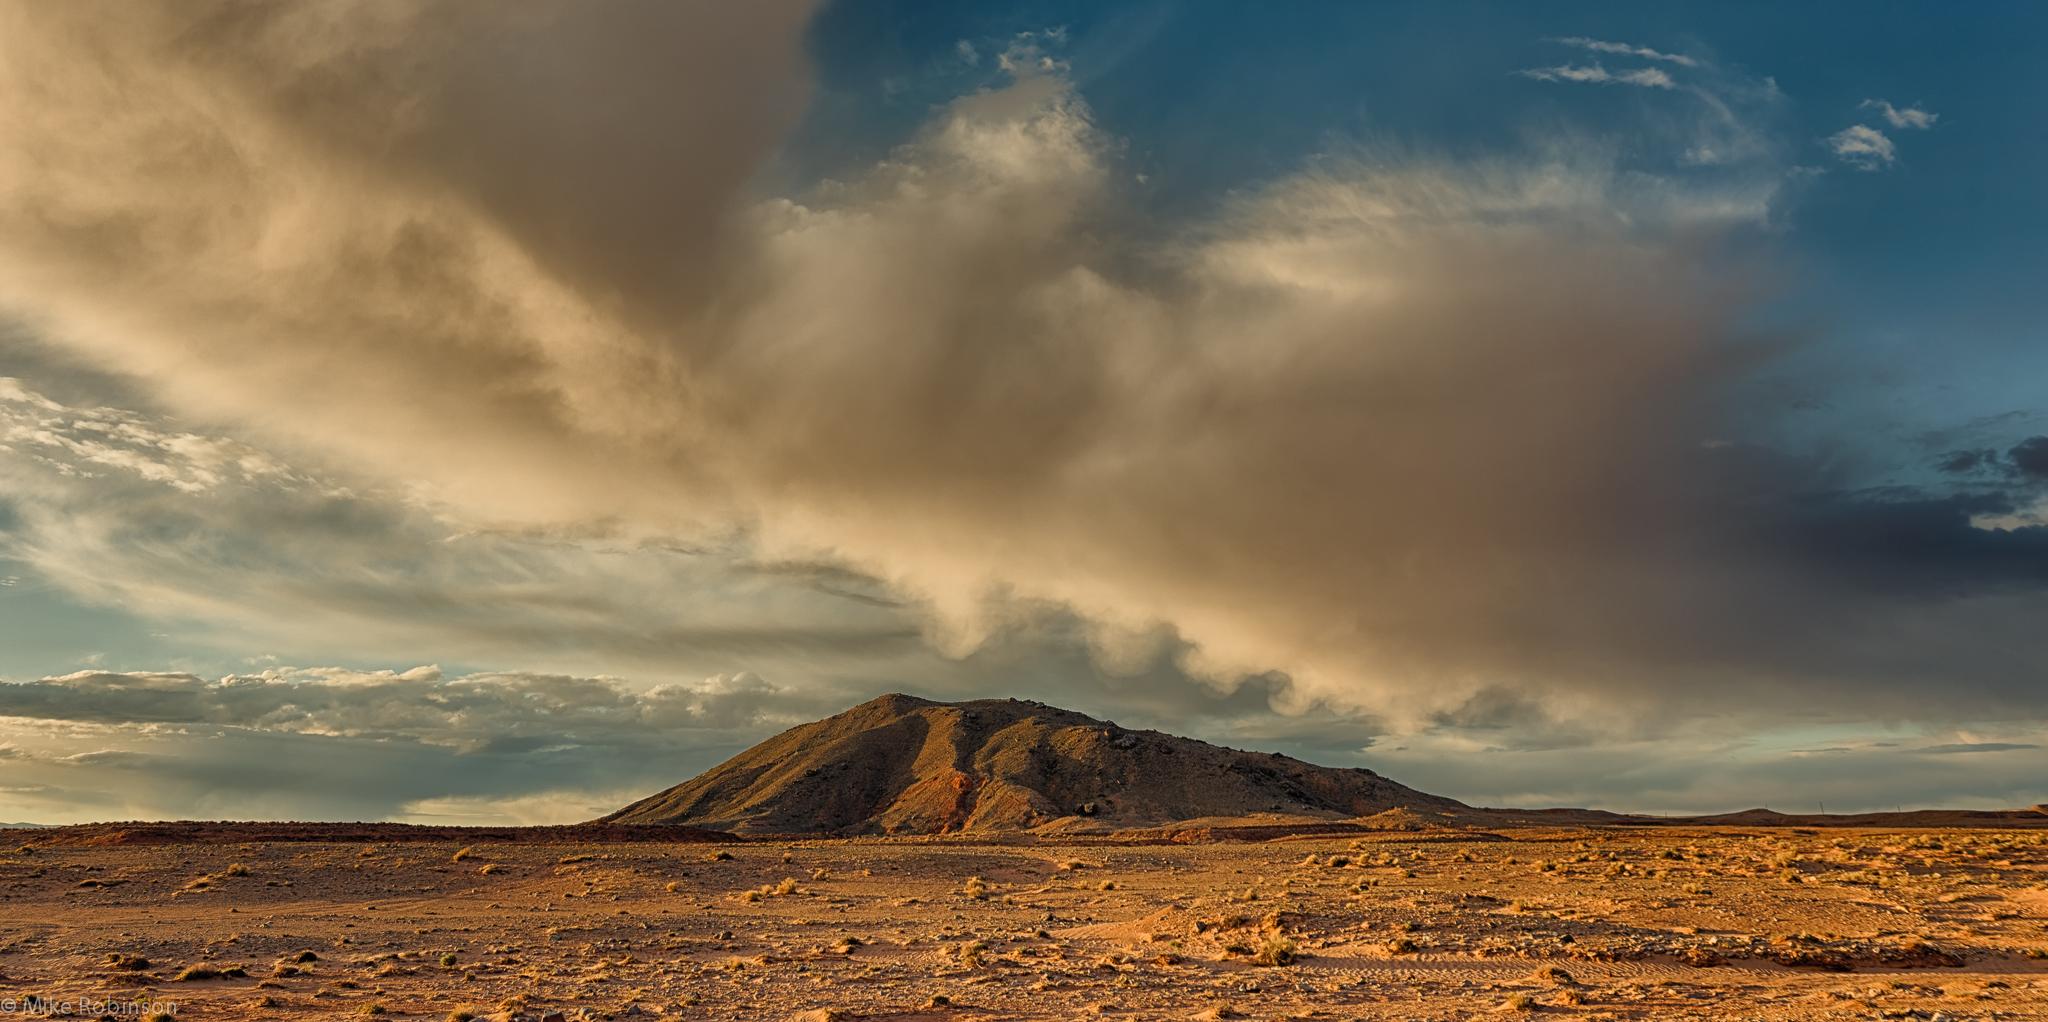 AZ_Desert_Morning_Clouds_HDR